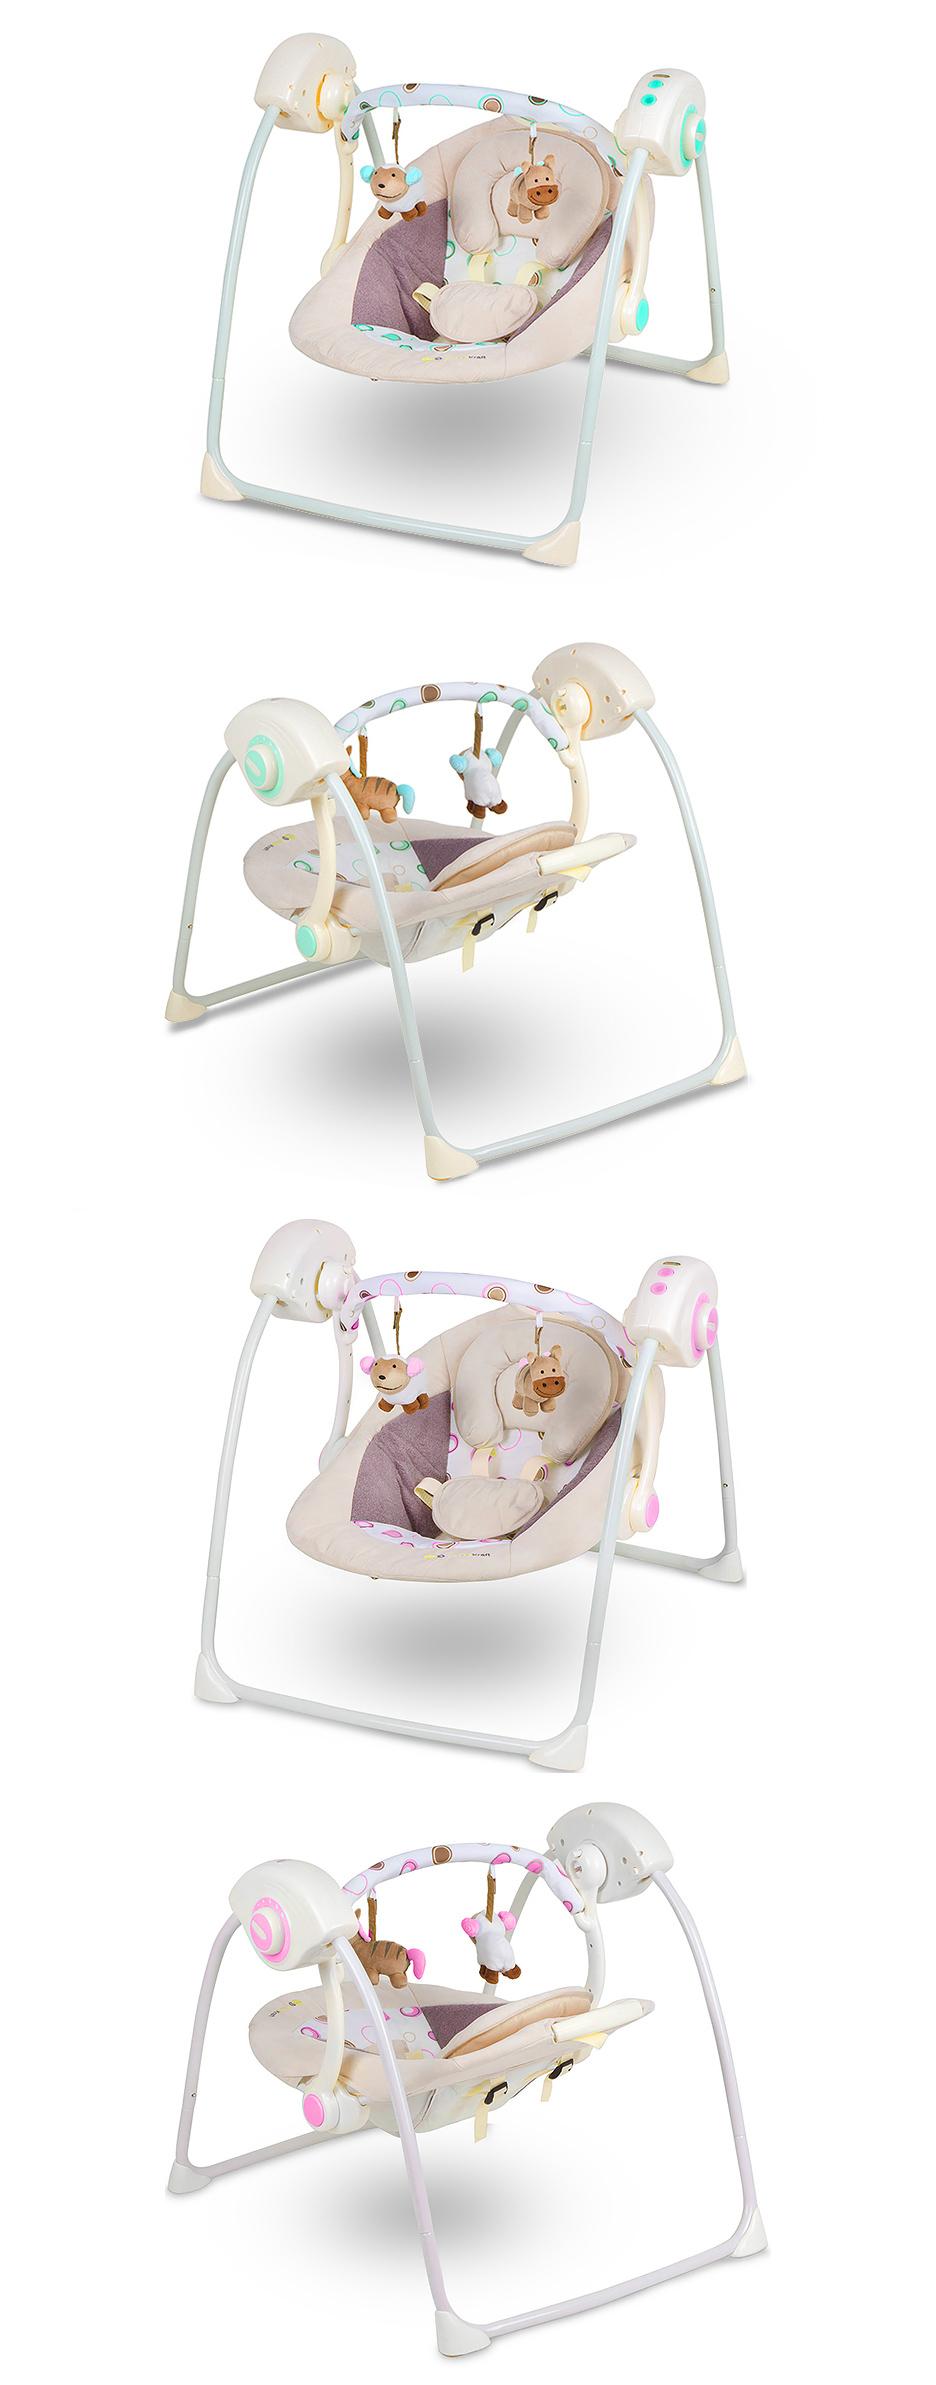 kinderkraft easyswing transat de b b balan oire pour bascule si ge porte b b ebay. Black Bedroom Furniture Sets. Home Design Ideas